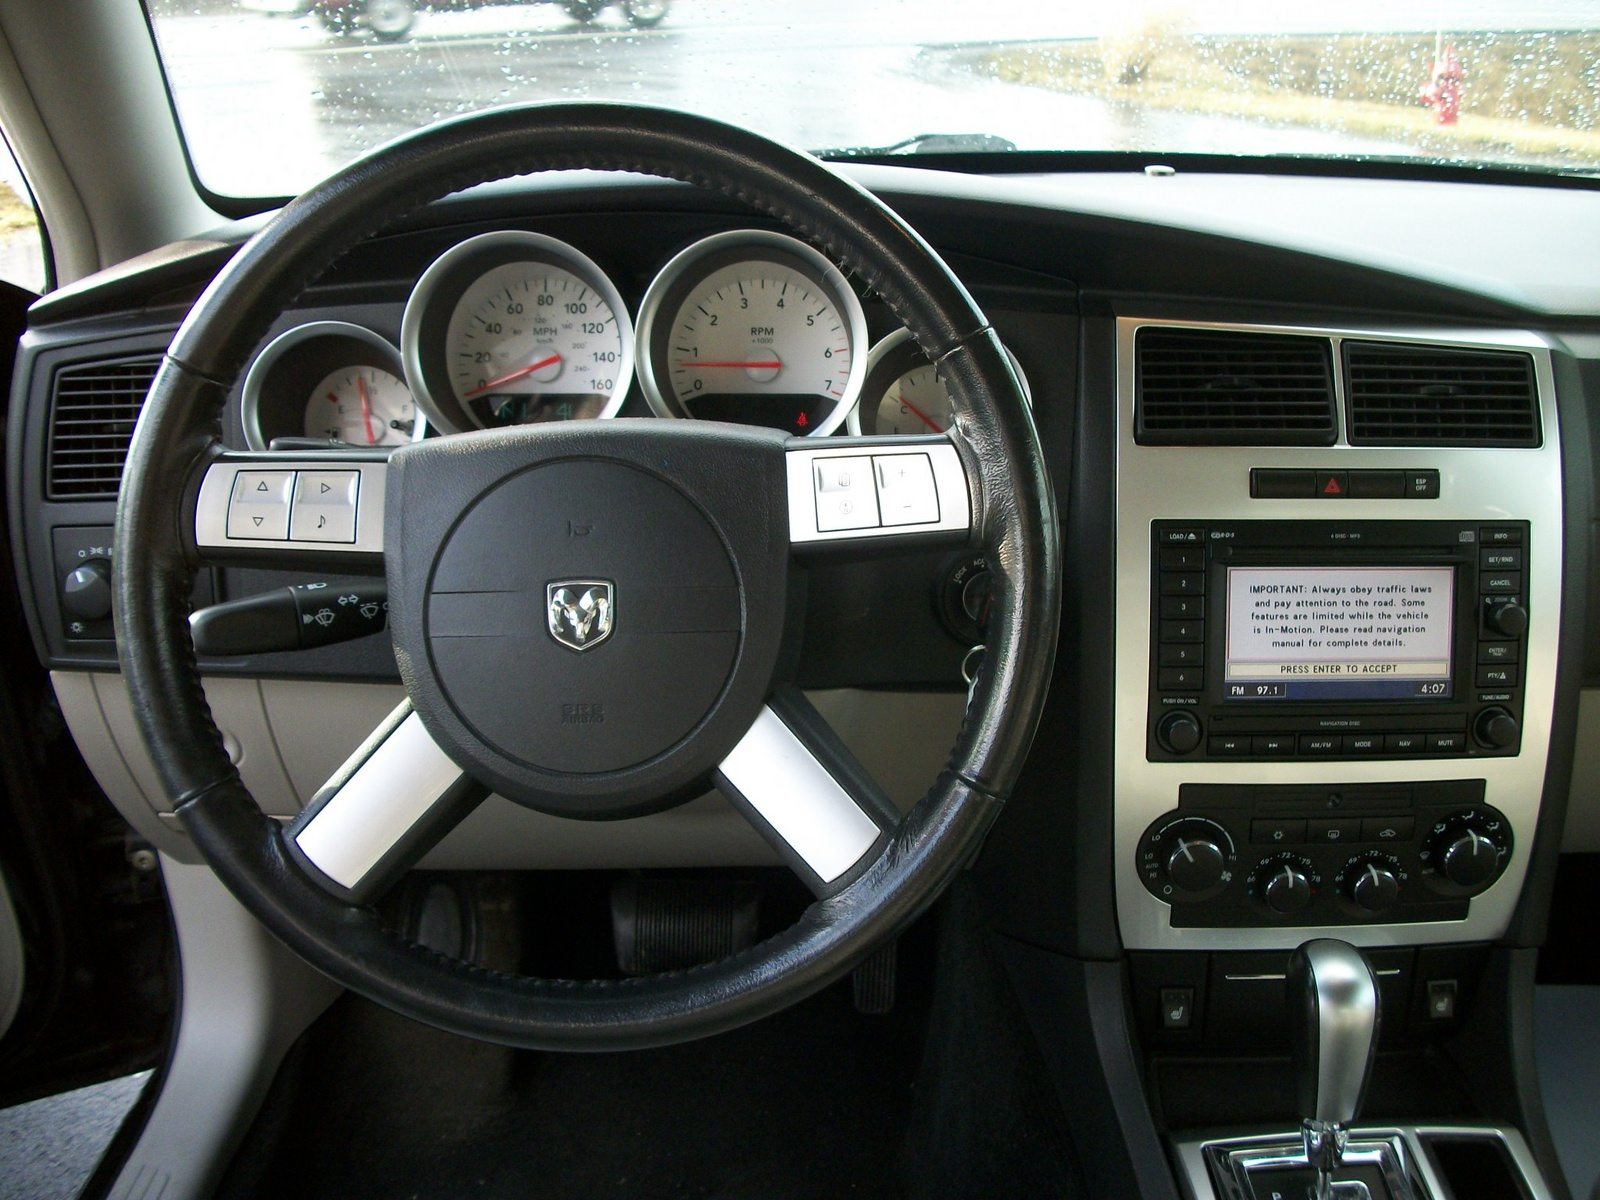 2006 Dodge Charger Interior Pictures Cargurus